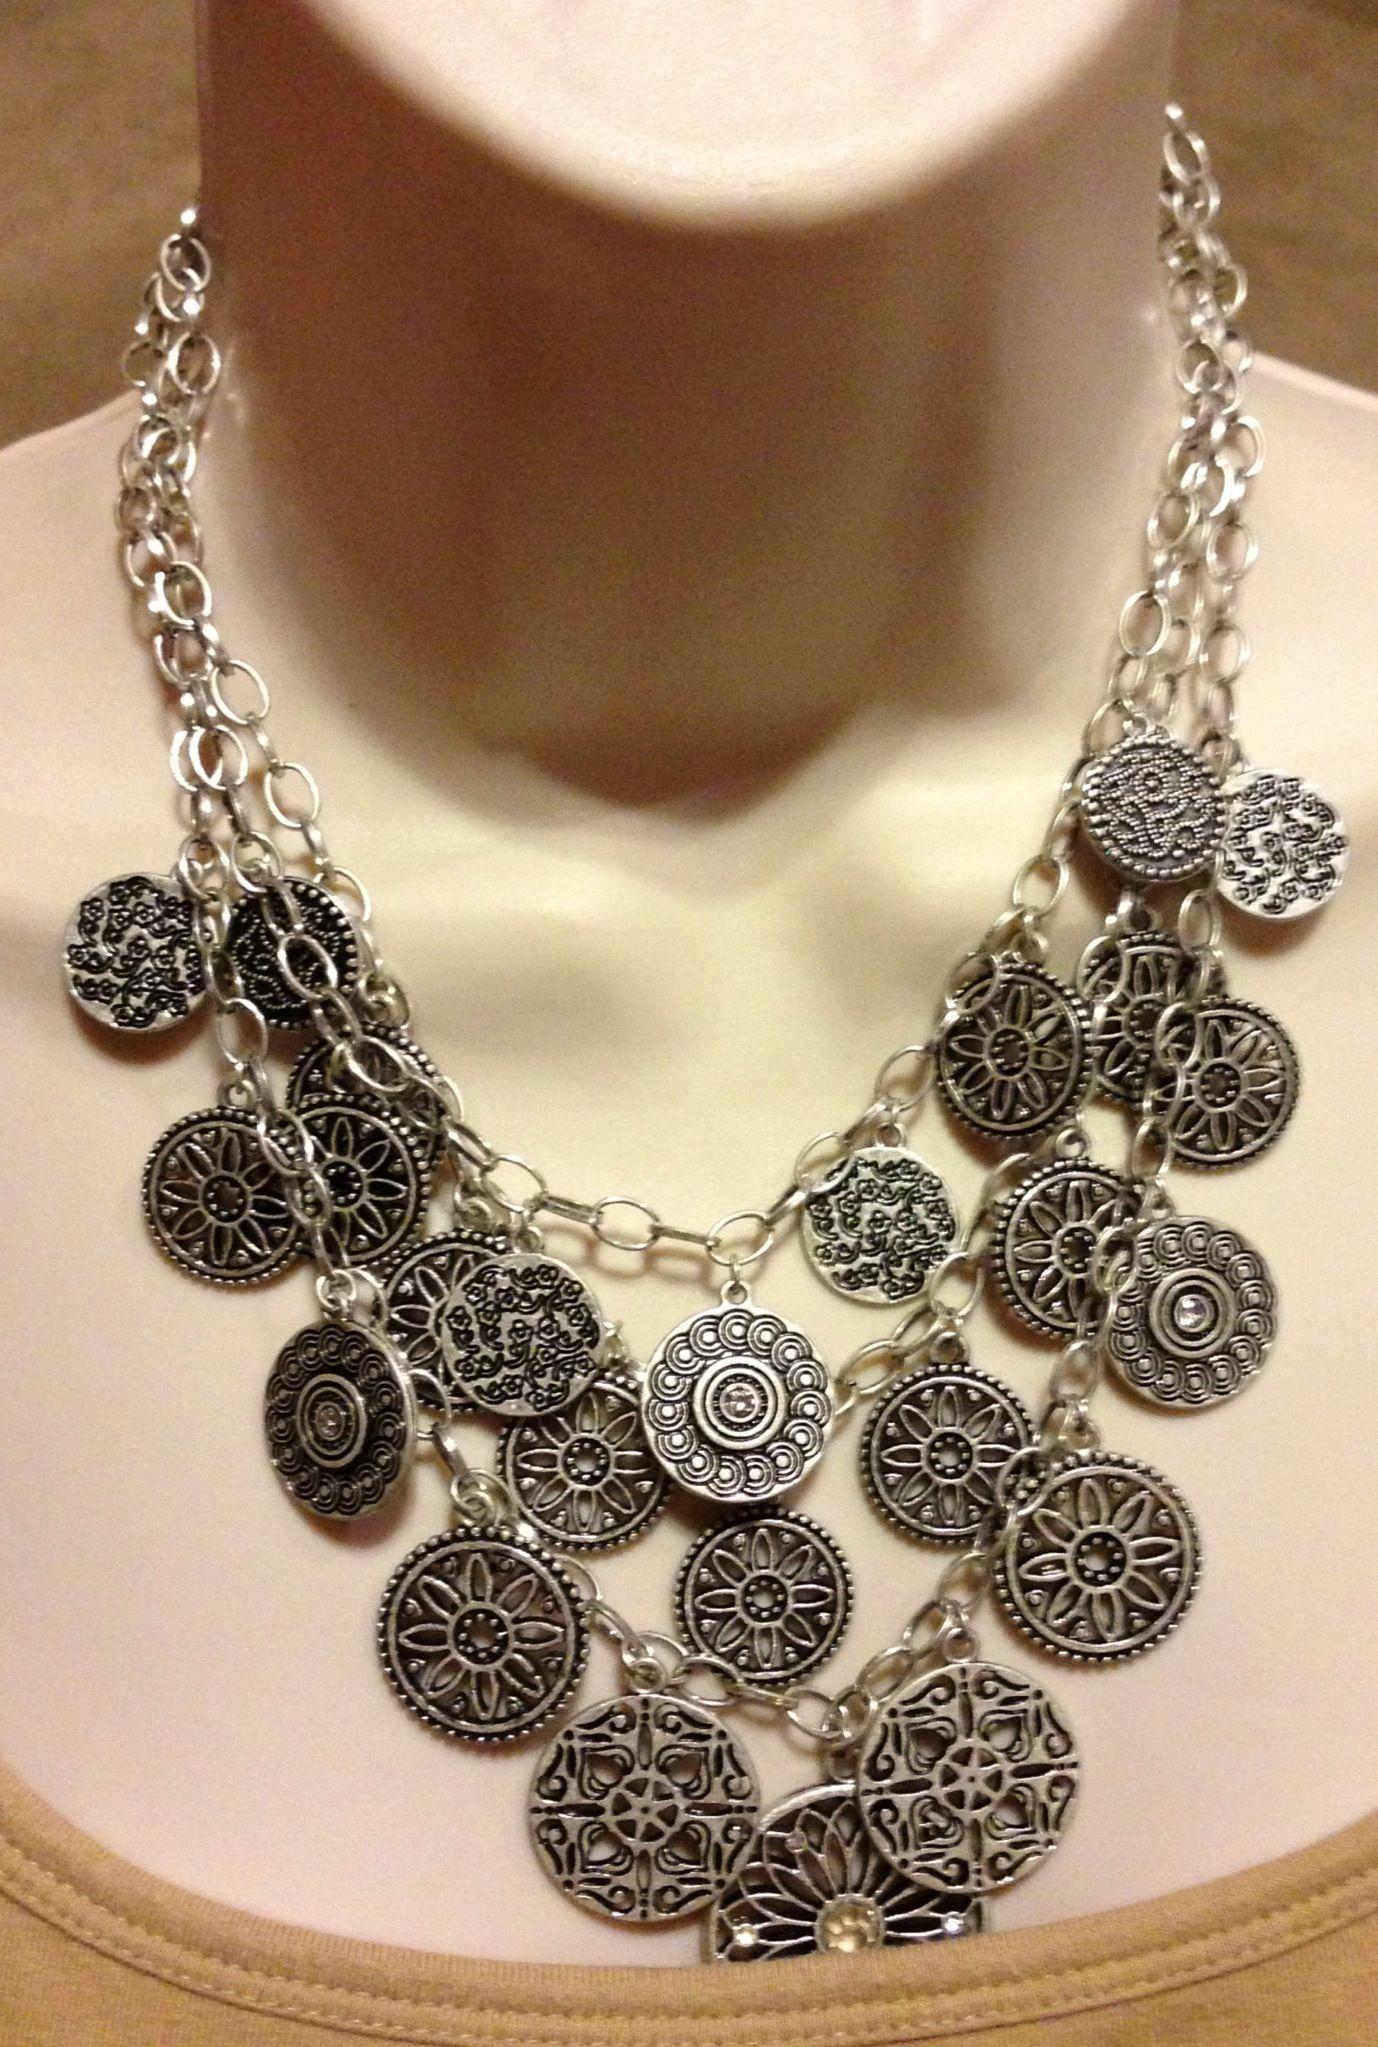 Leading Lady bib necklace